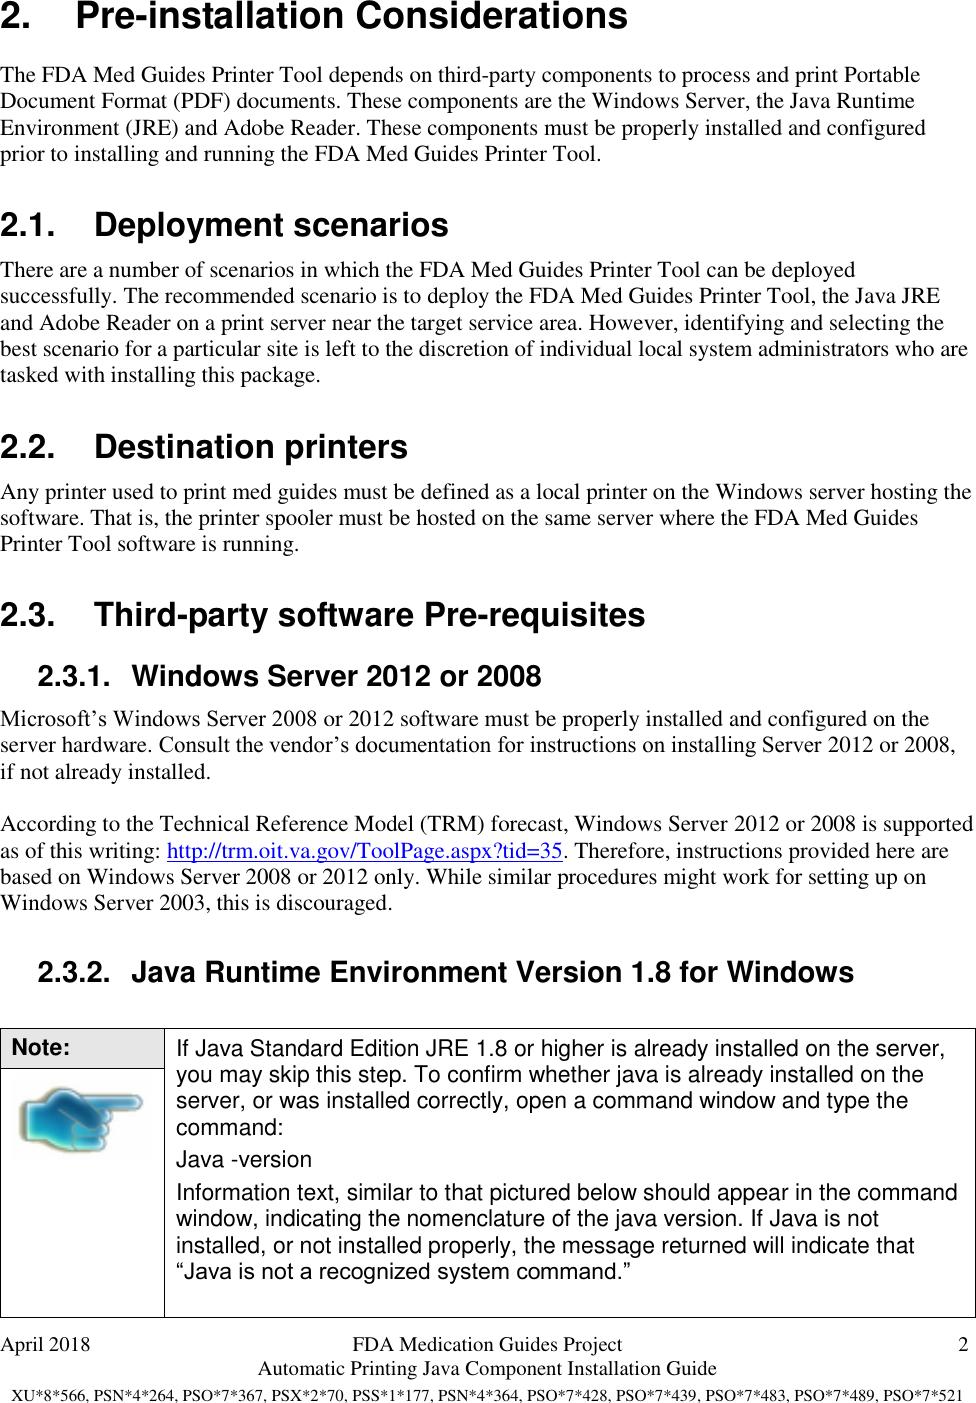 FDA Med Guides Java Component Installation Guide PHAR AUTO